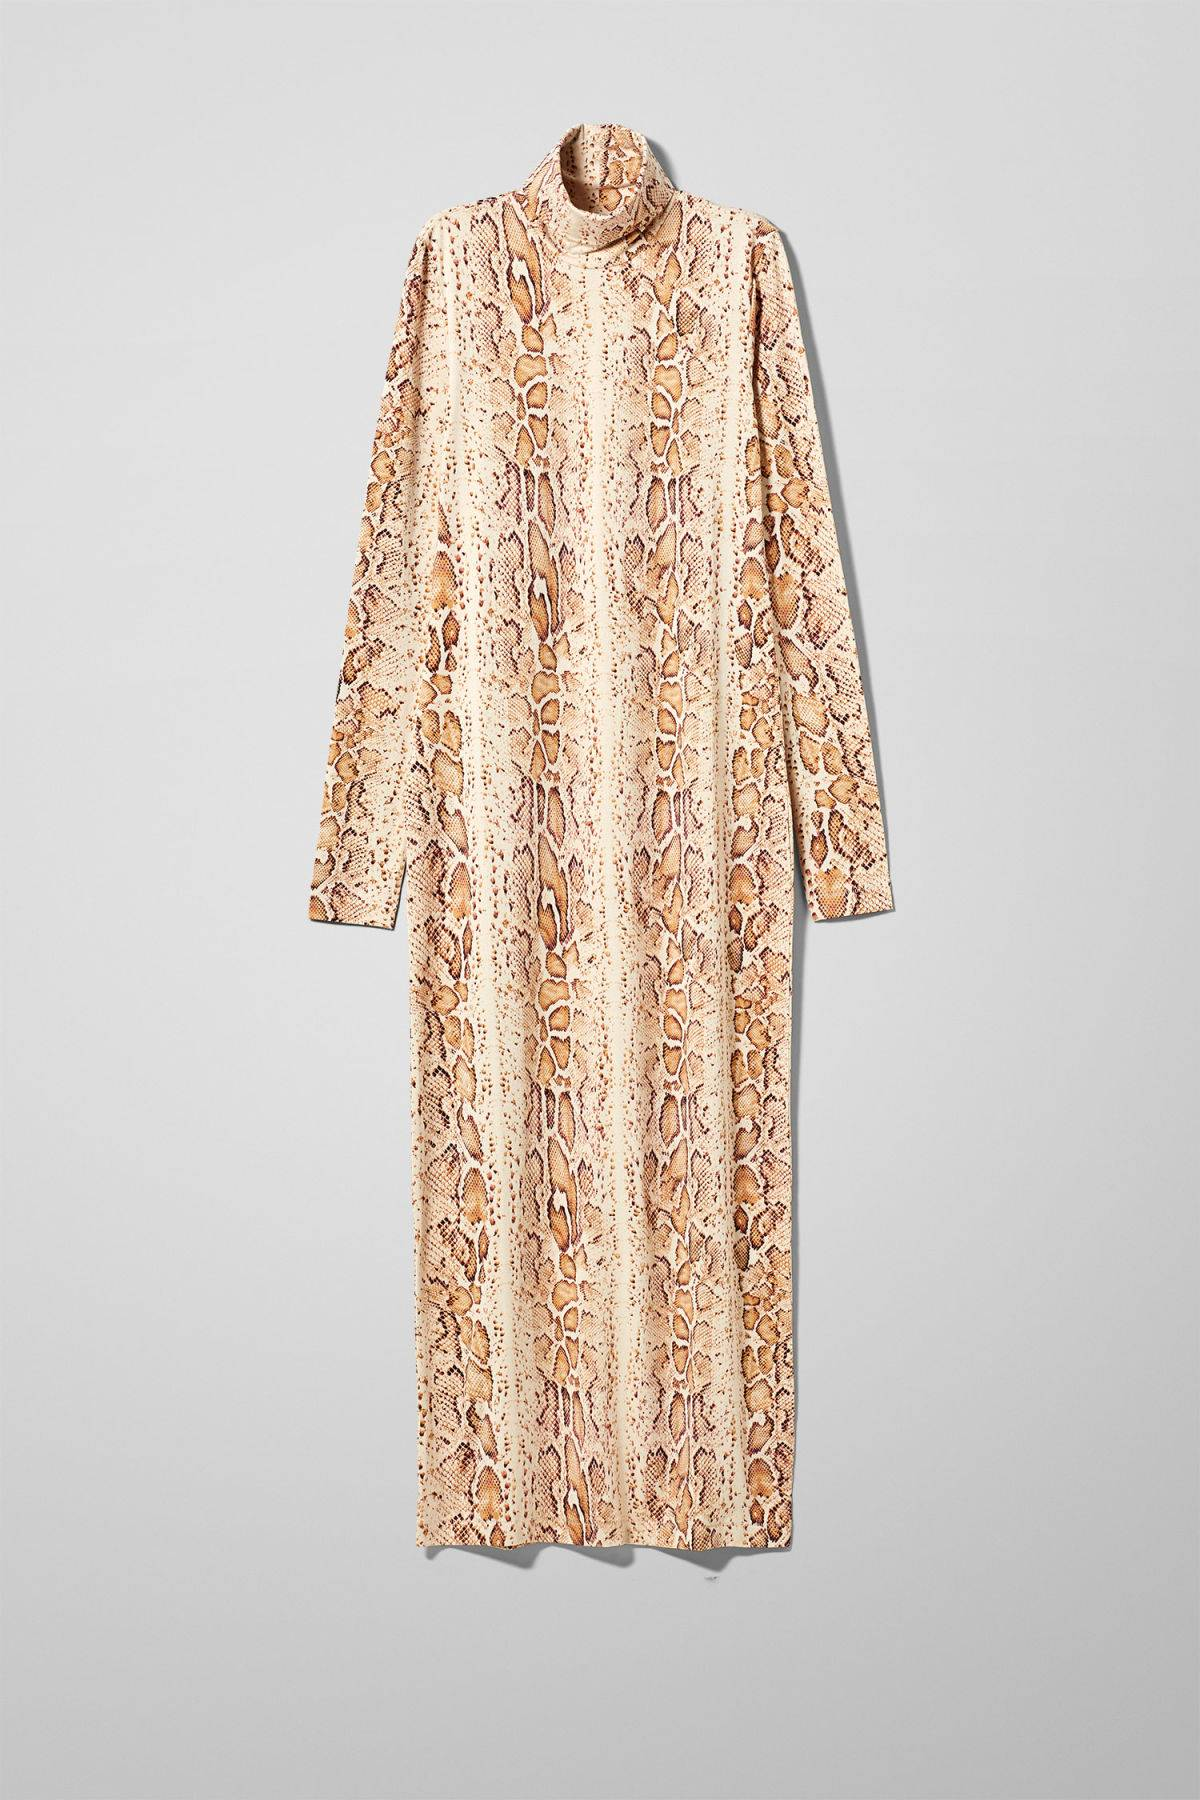 Image of Maxine Dress - Beige-M